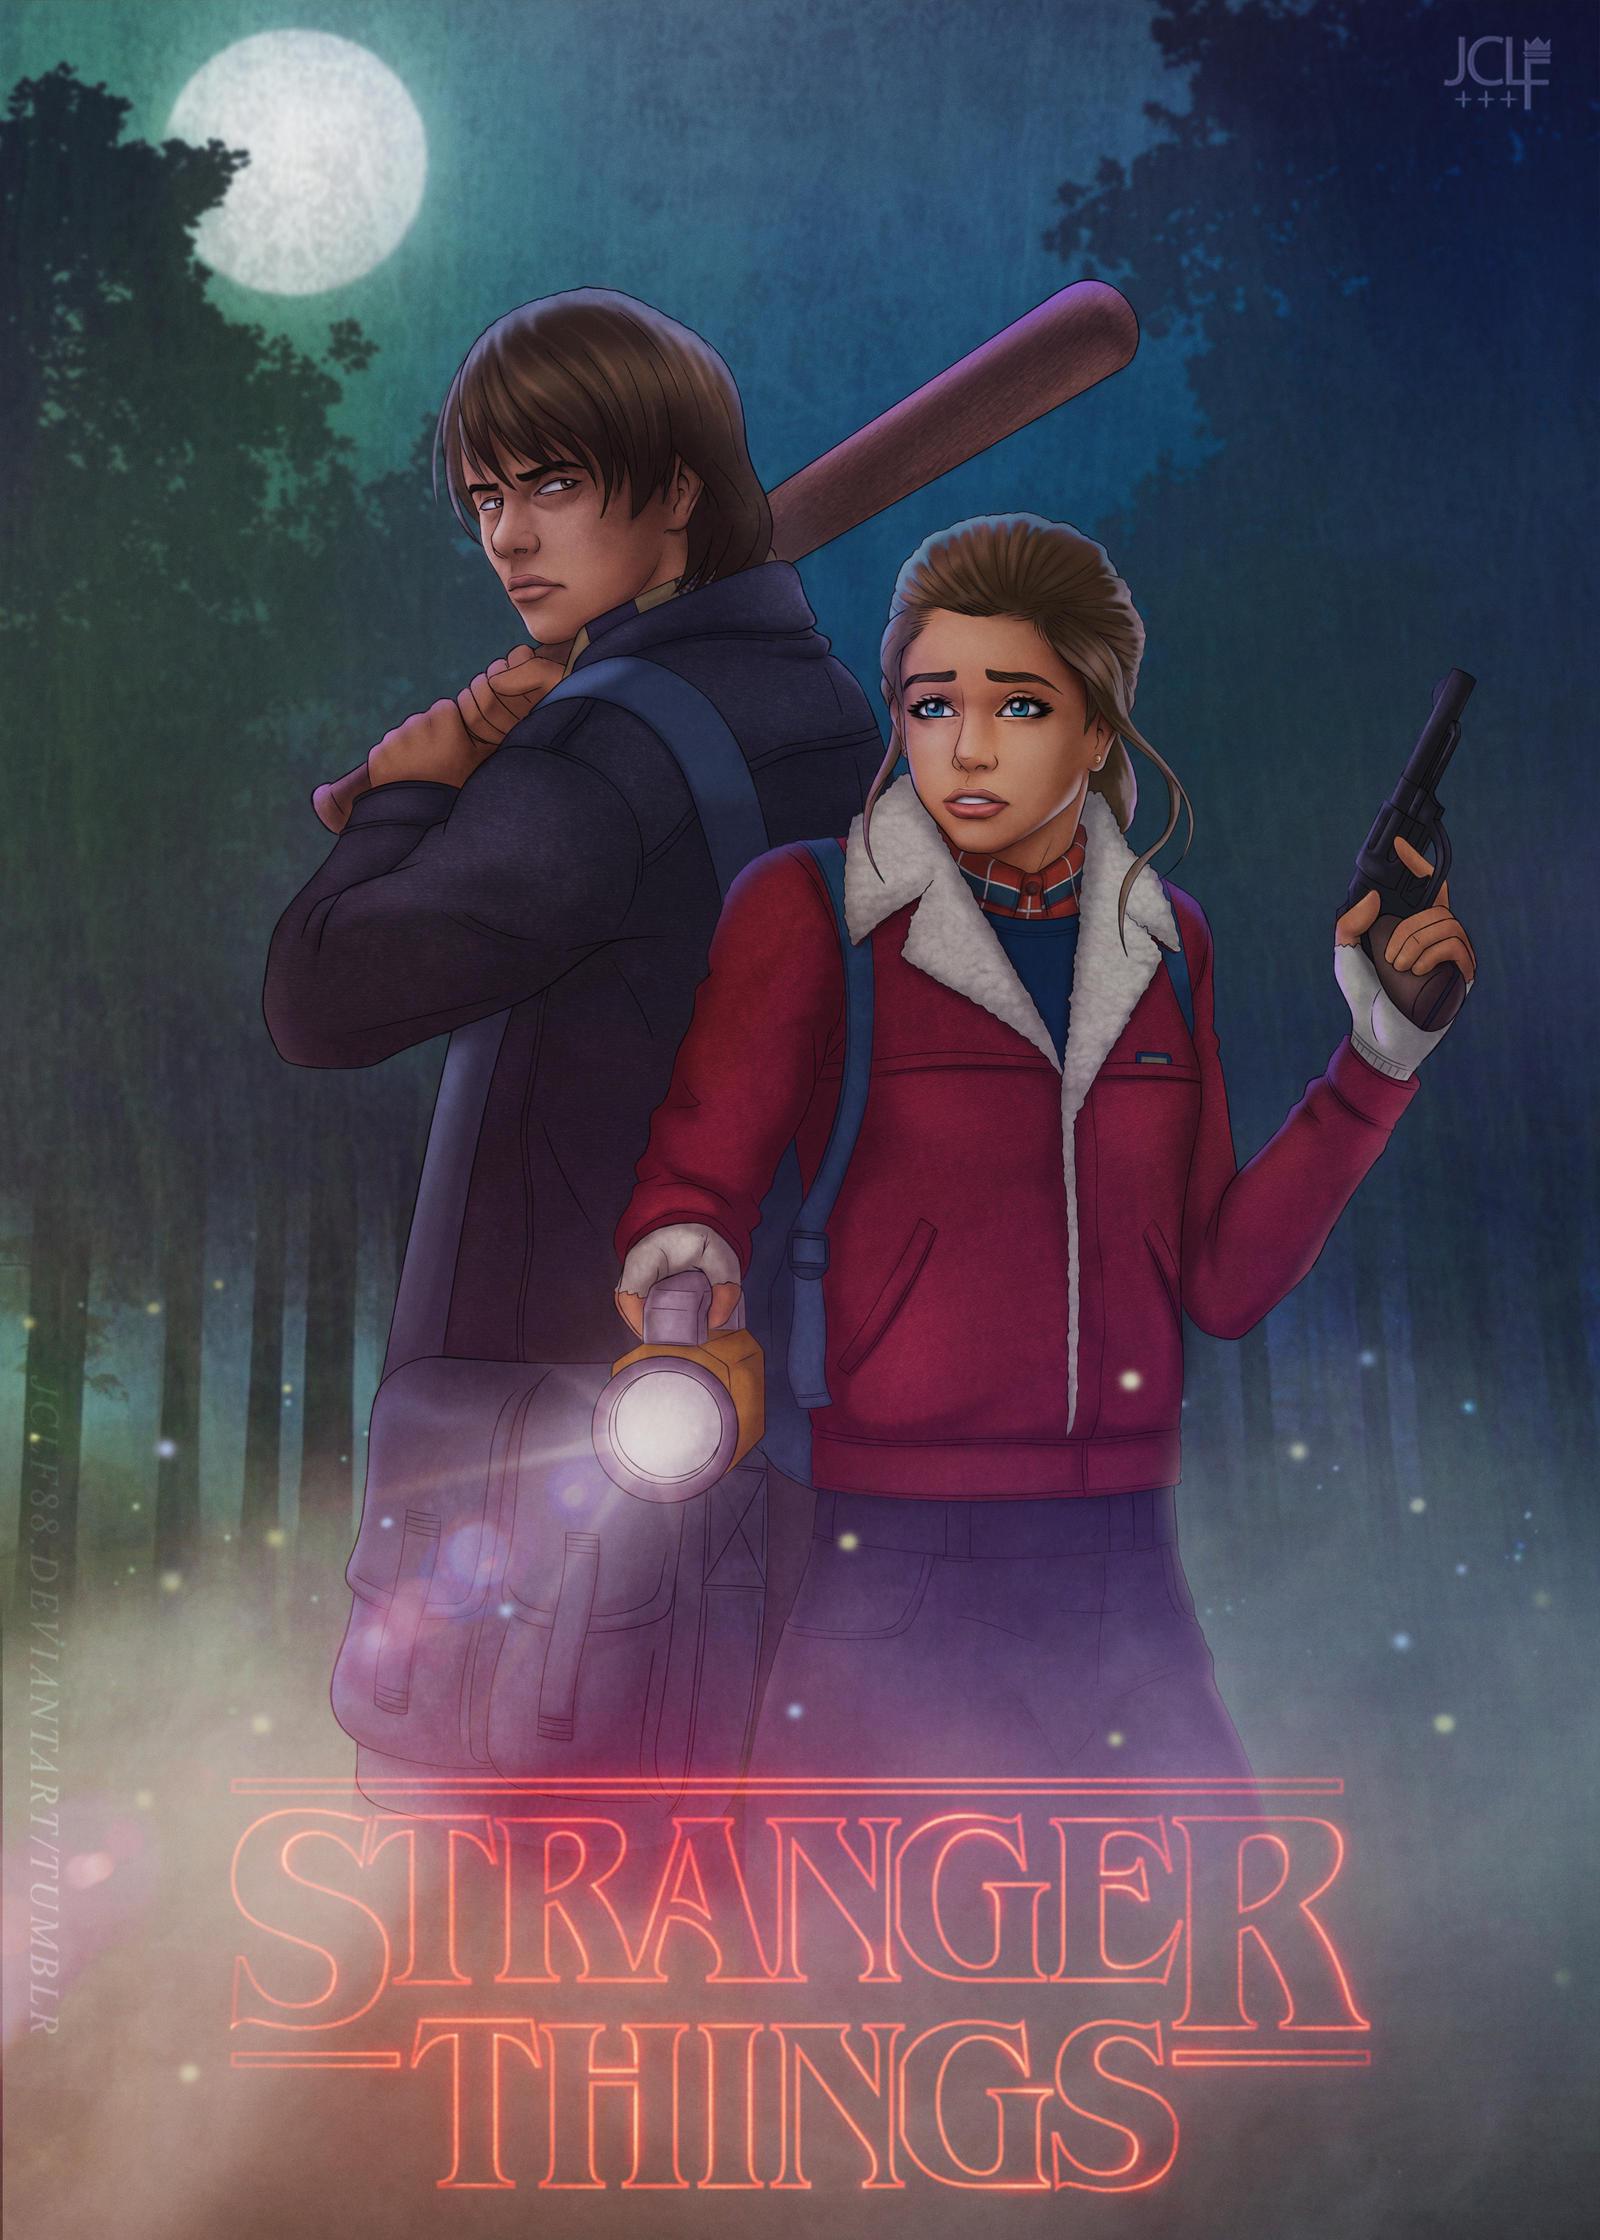 Stranger Things - Nancy x Jonathan by JCLF88 on DeviantArt